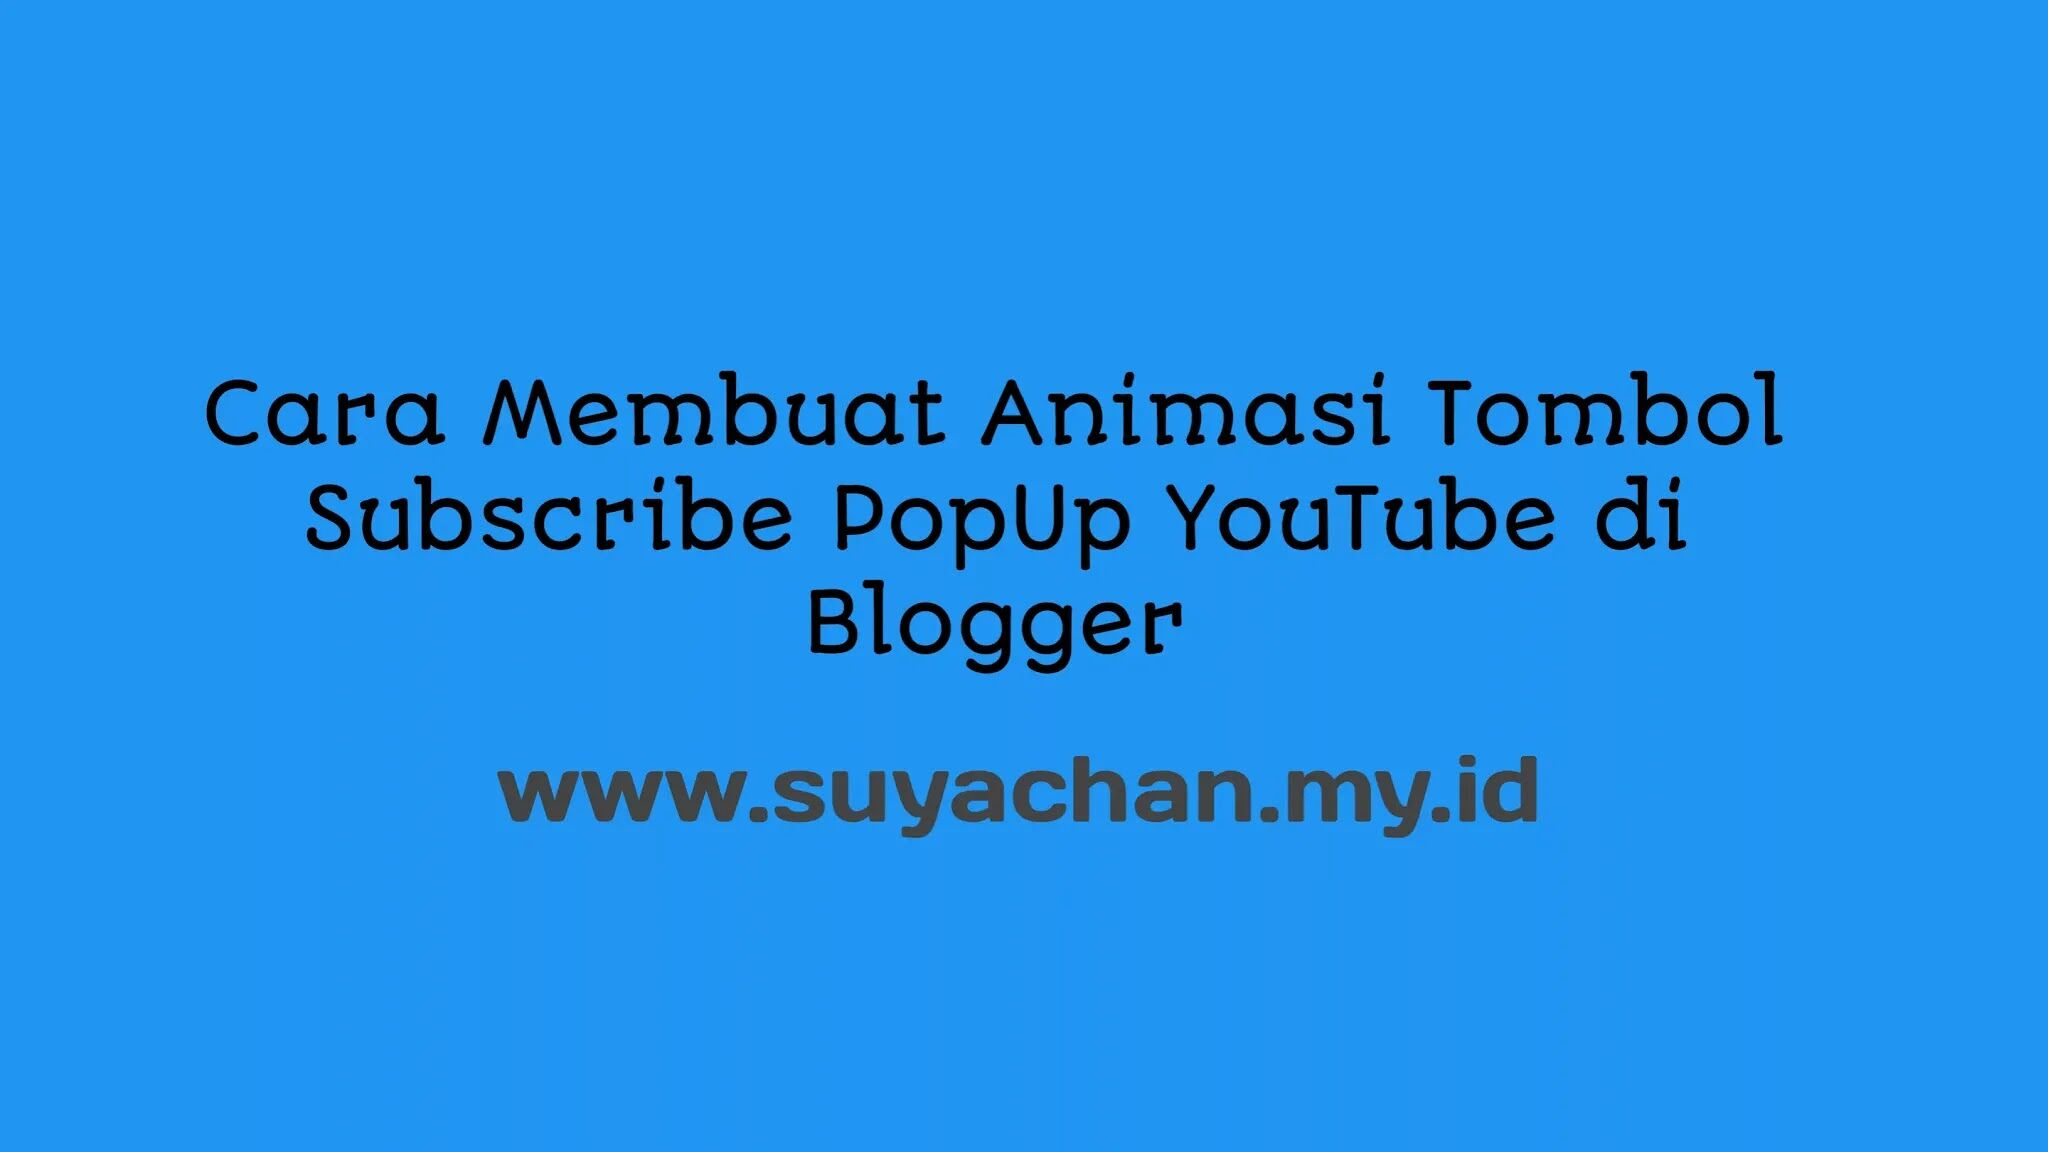 Cara Membuat Animasi Tombol Subscribe PopUp YouTube di Blogger